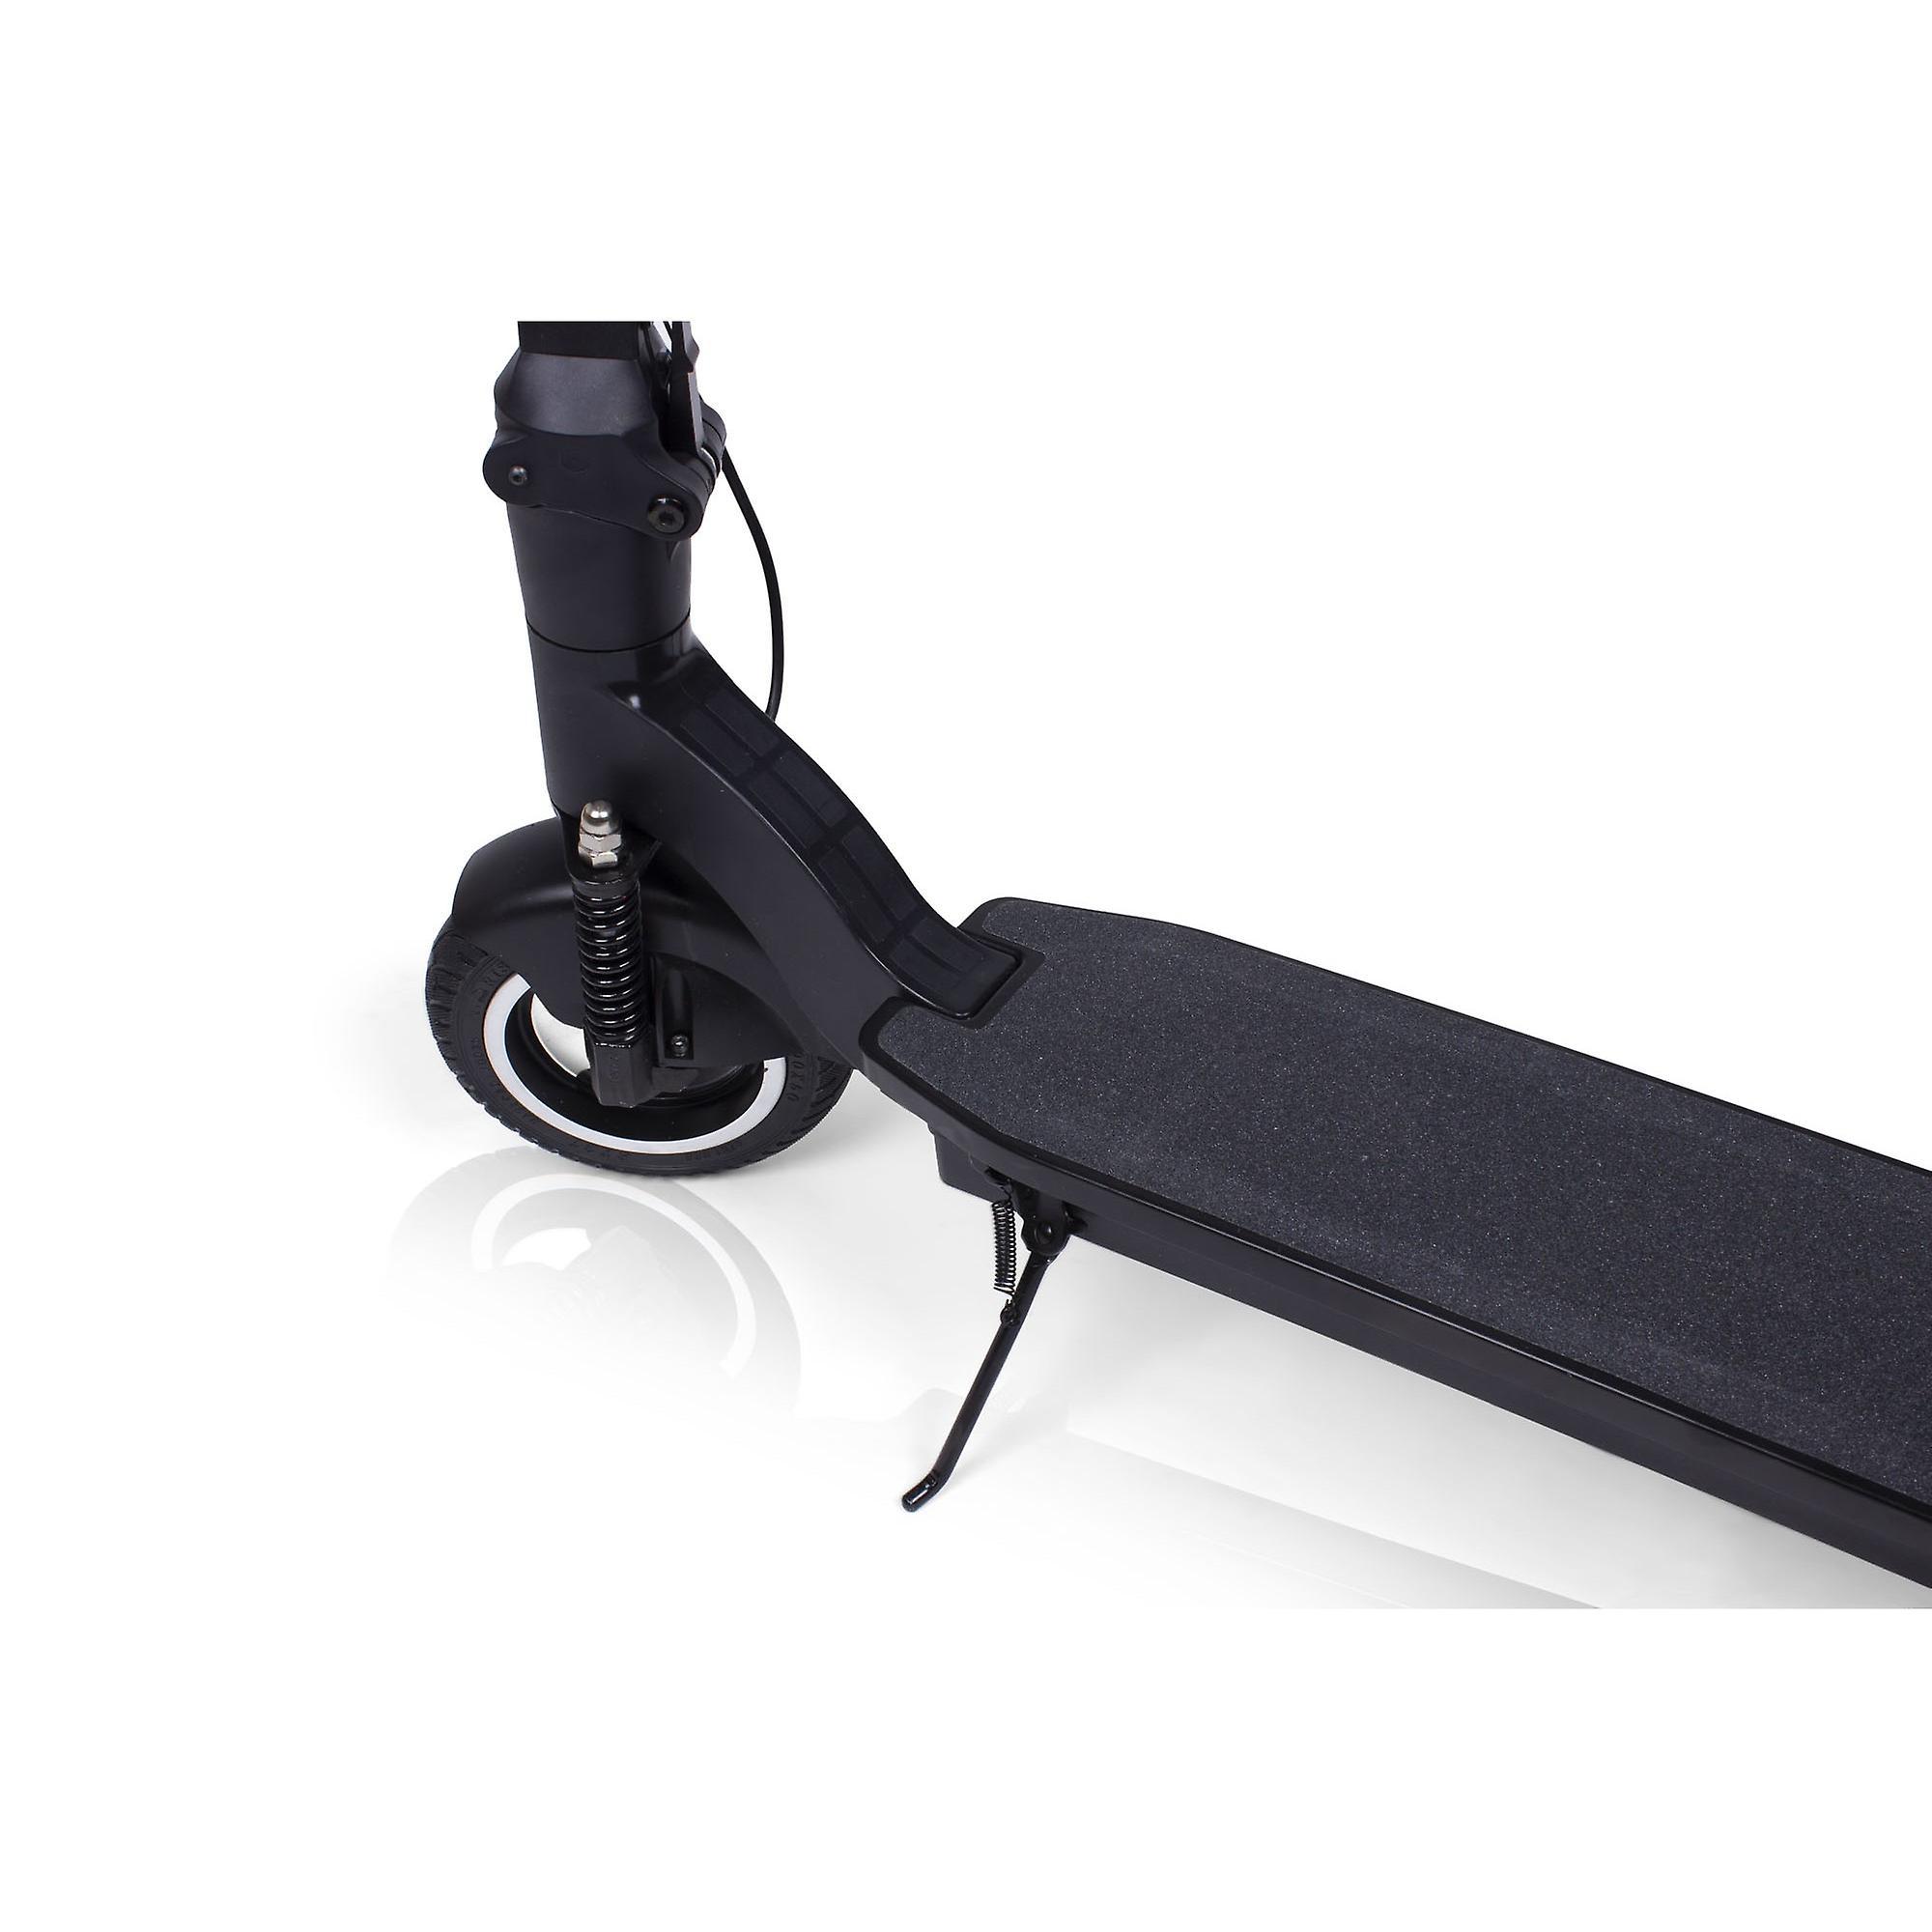 Skateflash Up Black Electric Skateboard